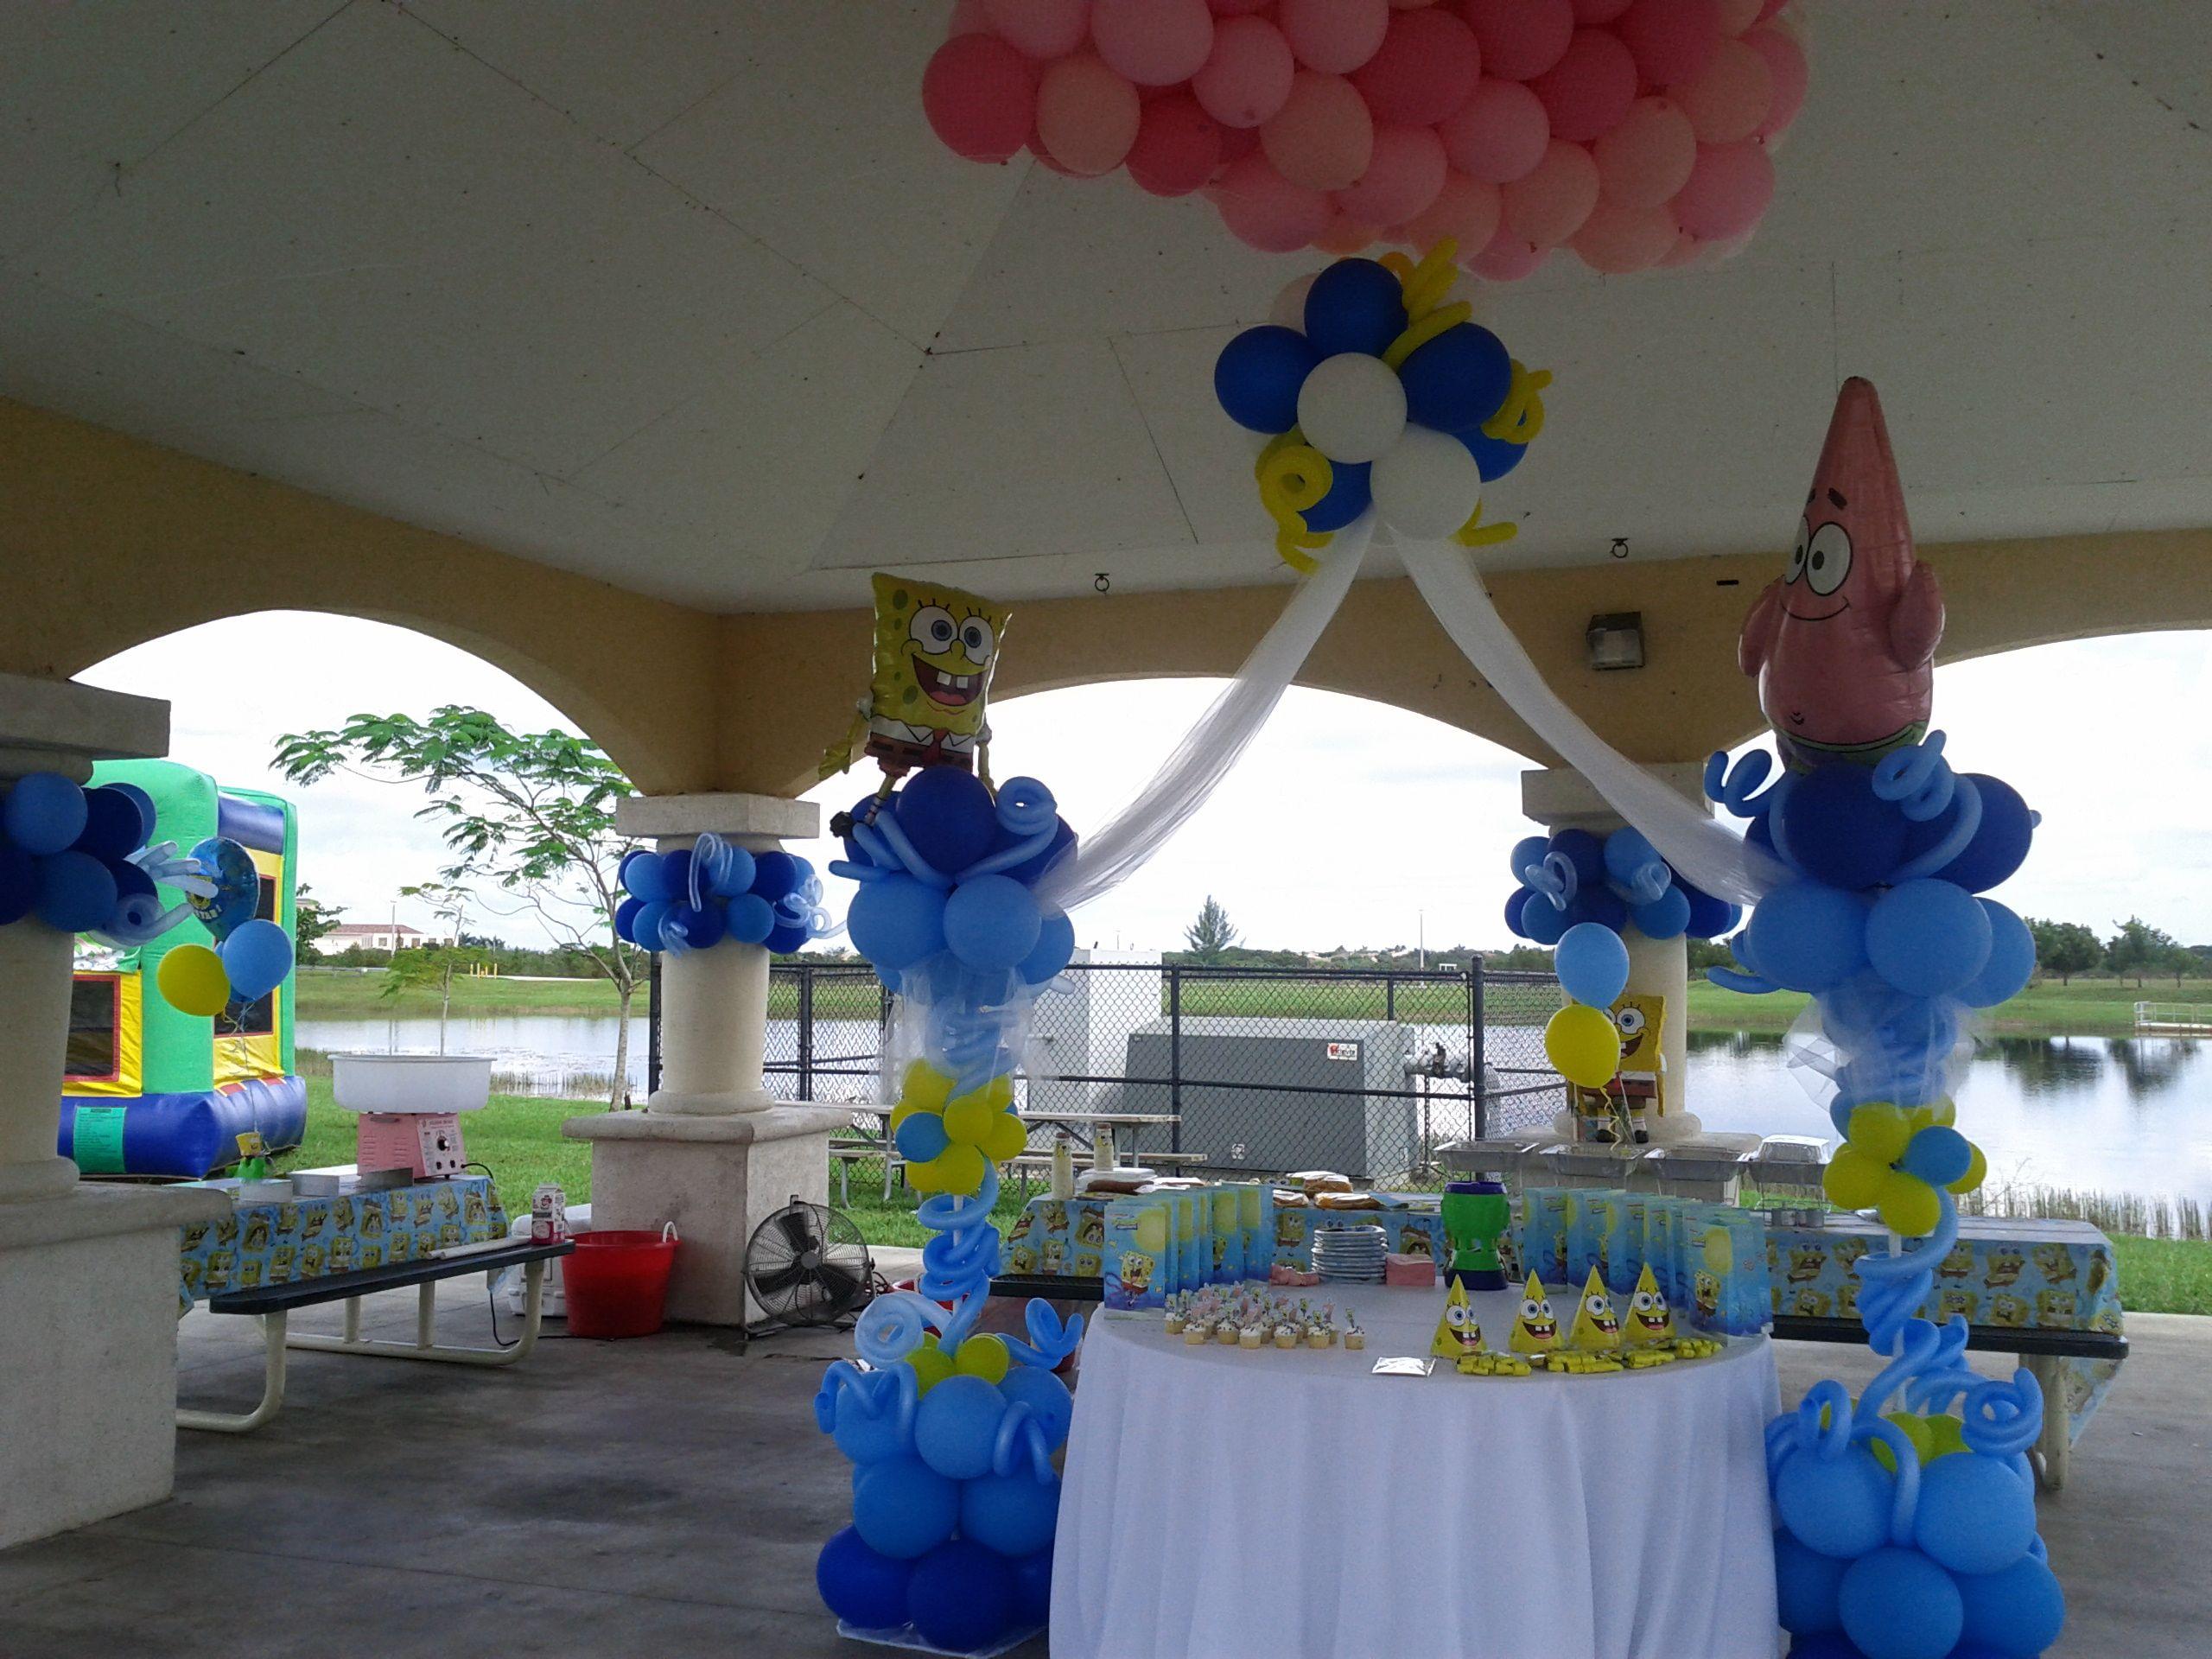 Sponge Bob Theme Balloon Decoration Park Kids Party